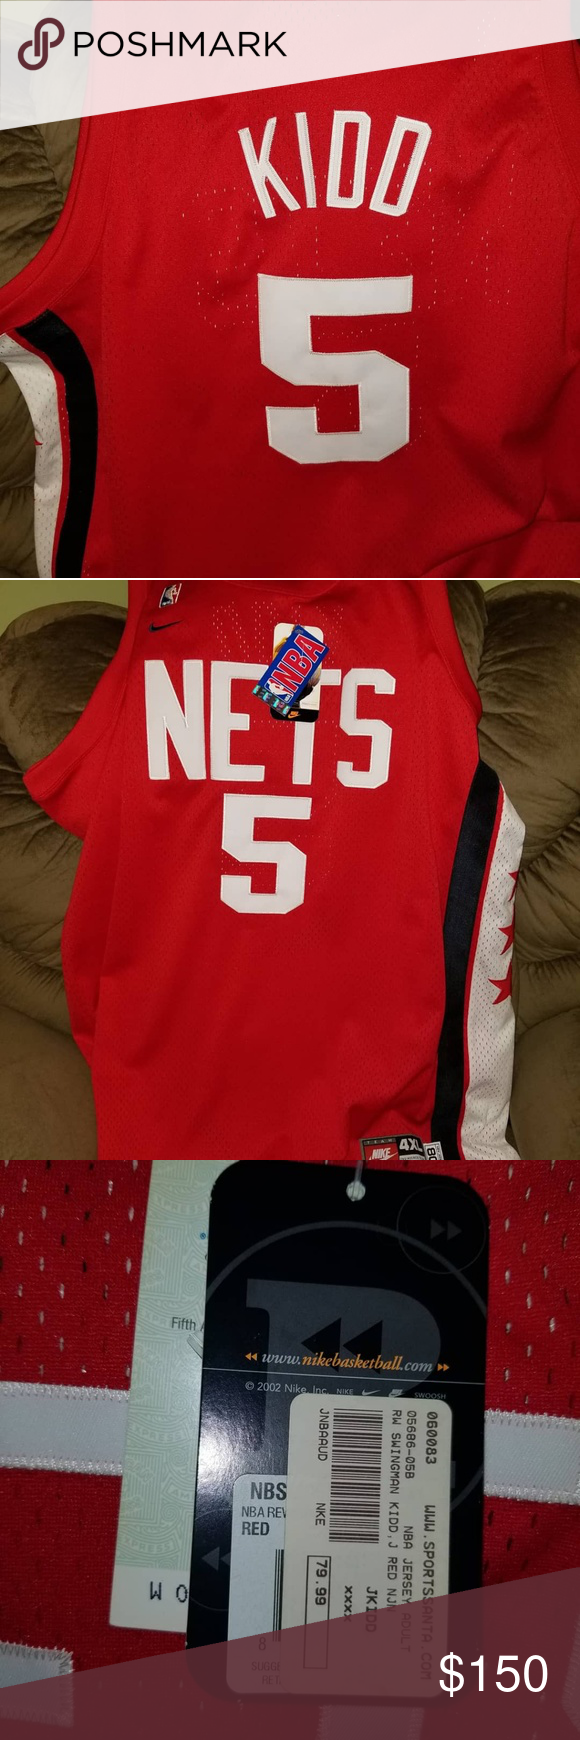 wholesale dealer 0cf56 cc887 Jason Kidd Nike retro jersey 100% Authentic Jason Kidd New ...